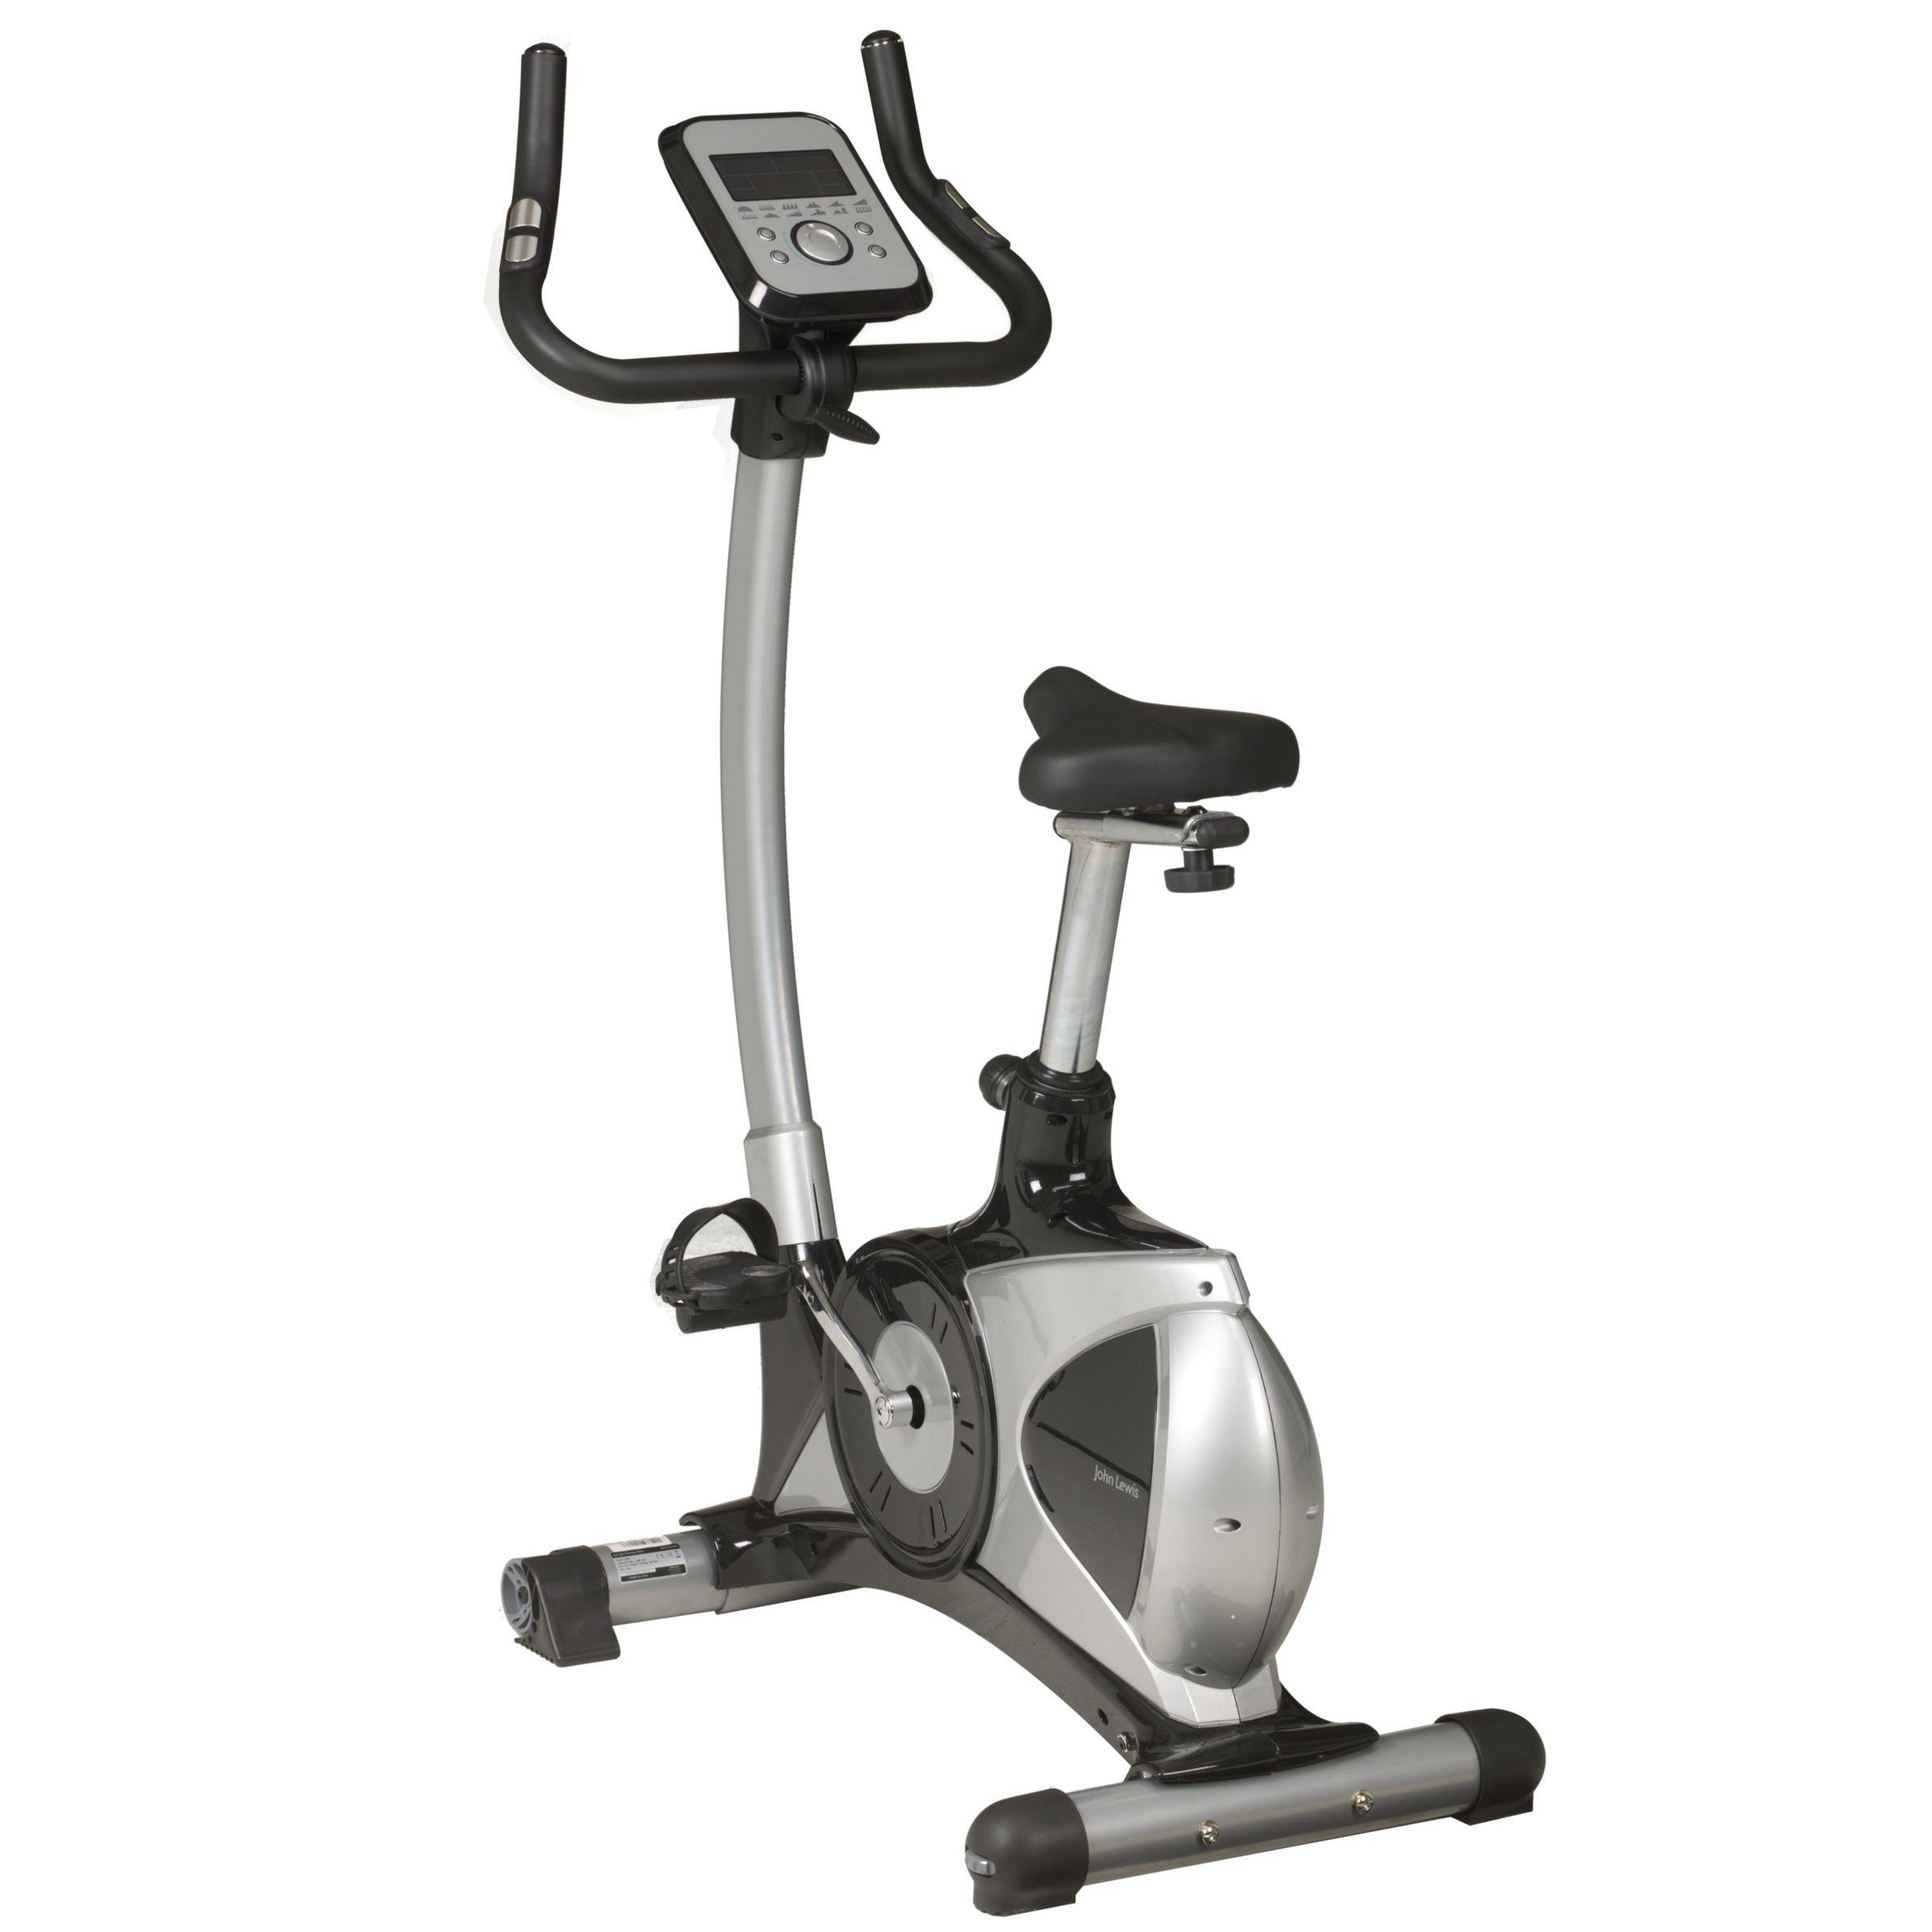 Gym Equipment John Lewis